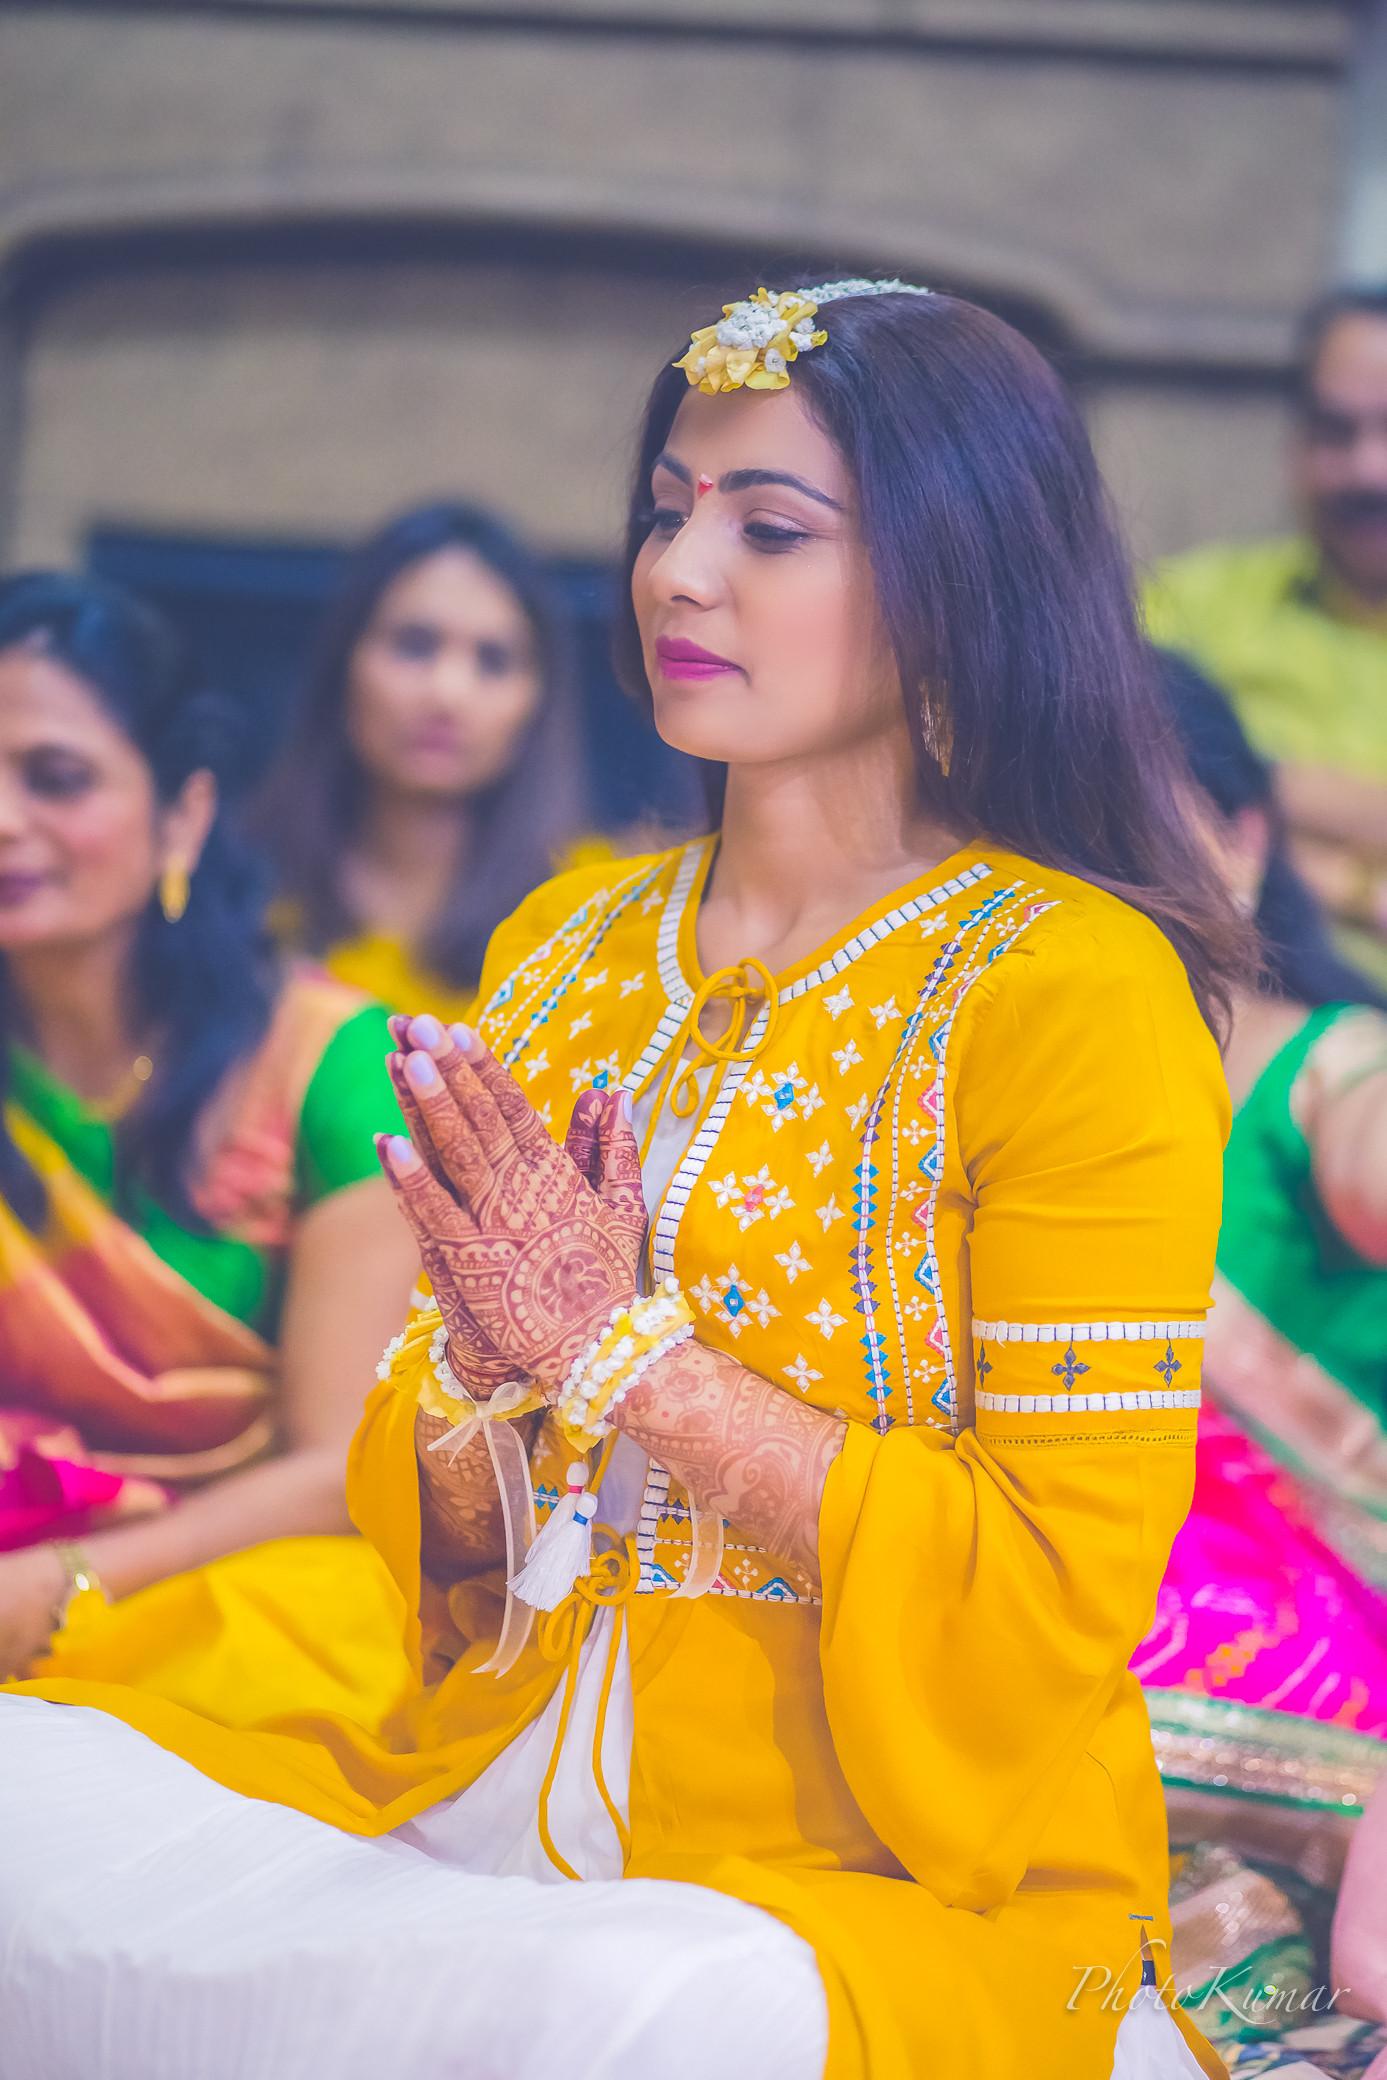 PhotoKumar-Nilam-Pre-wedding-irving-dallas-texas-13.jpg